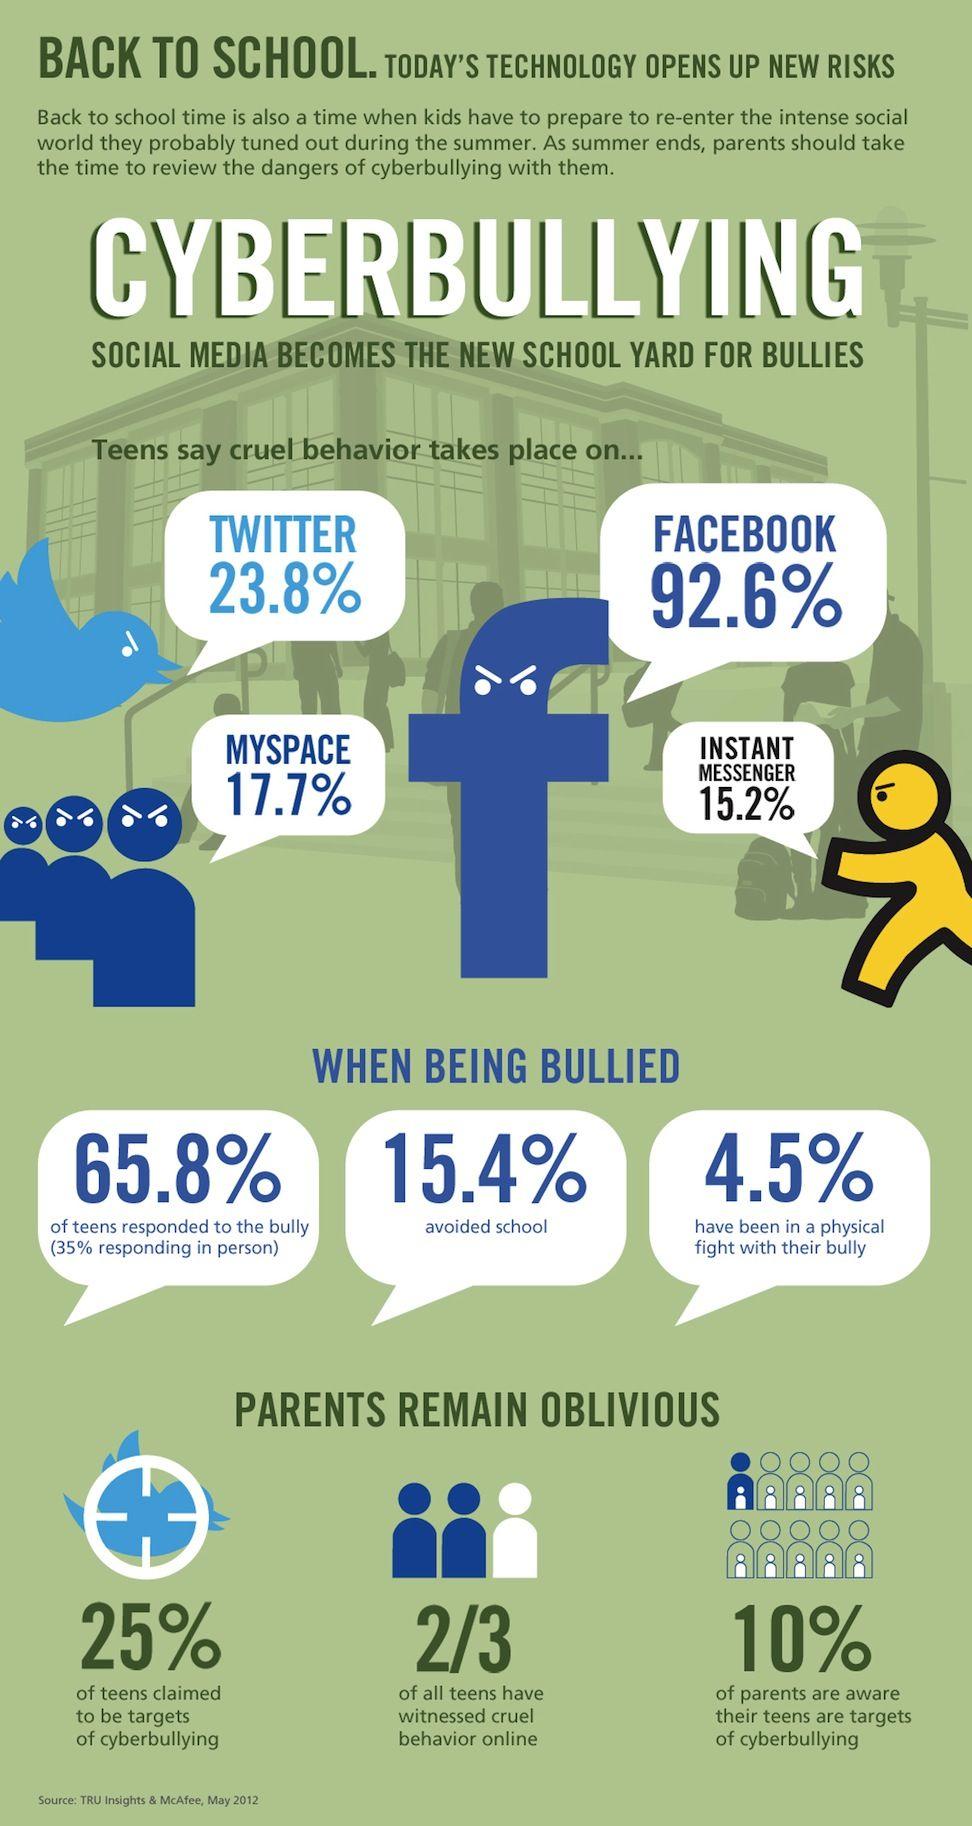 Cyberbullying Statistics 2012 - iNFOGRAPHiCs MANiA ...